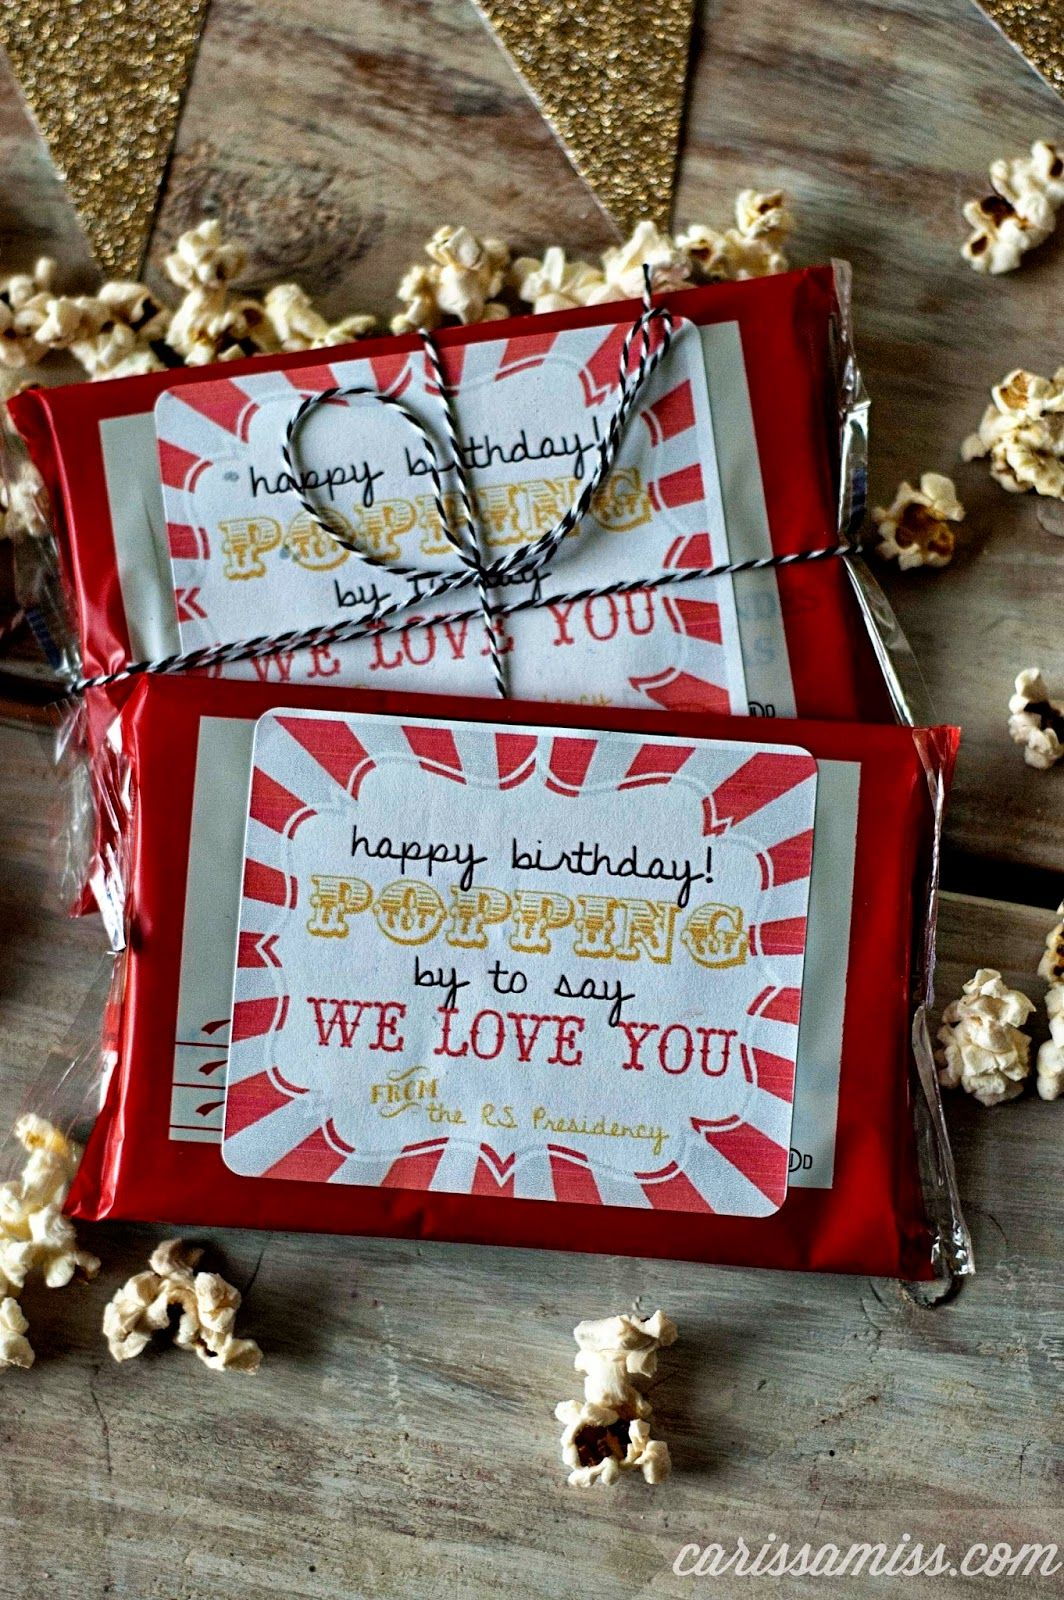 Happy Birthday Popcorn Printable | Gift Ideas | Pinterest ...